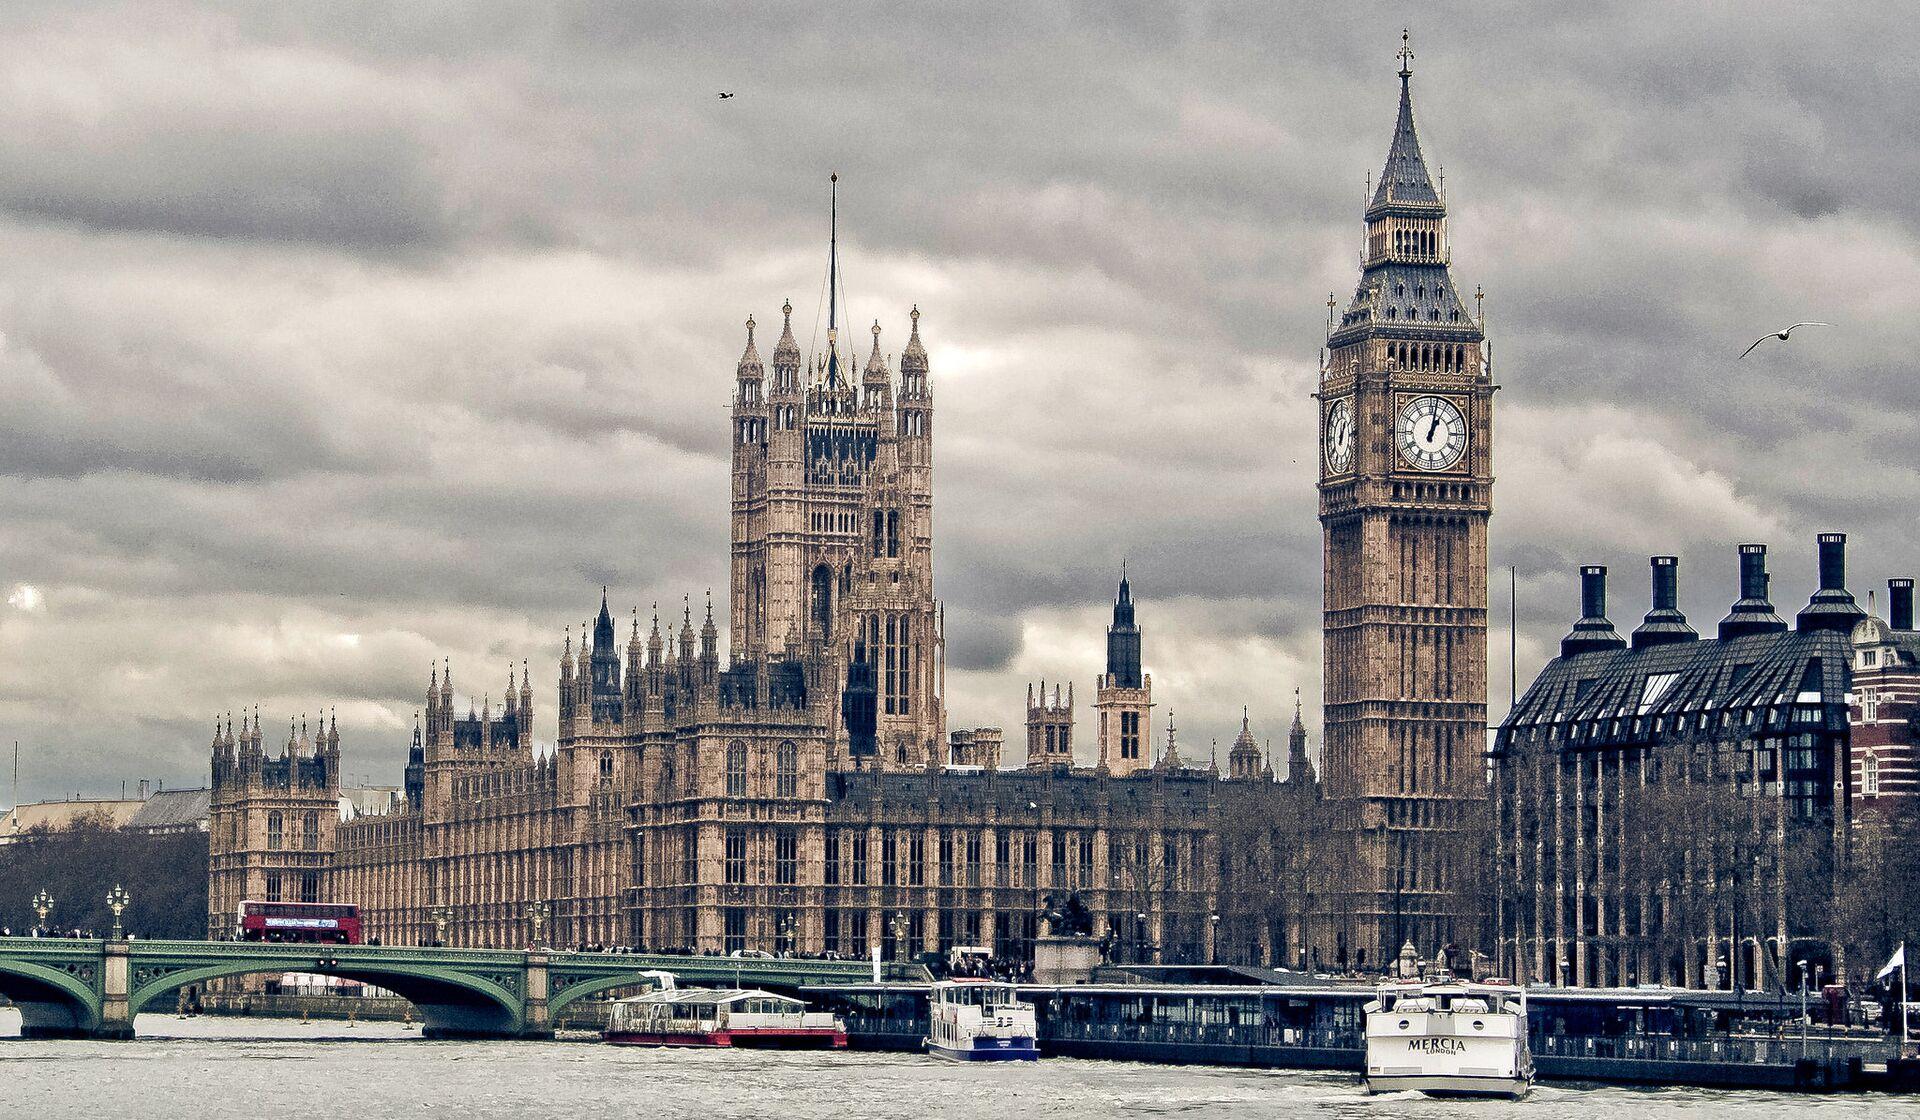 Здание парламента Великобритании в Лондоне - РИА Новости, 1920, 19.01.2021